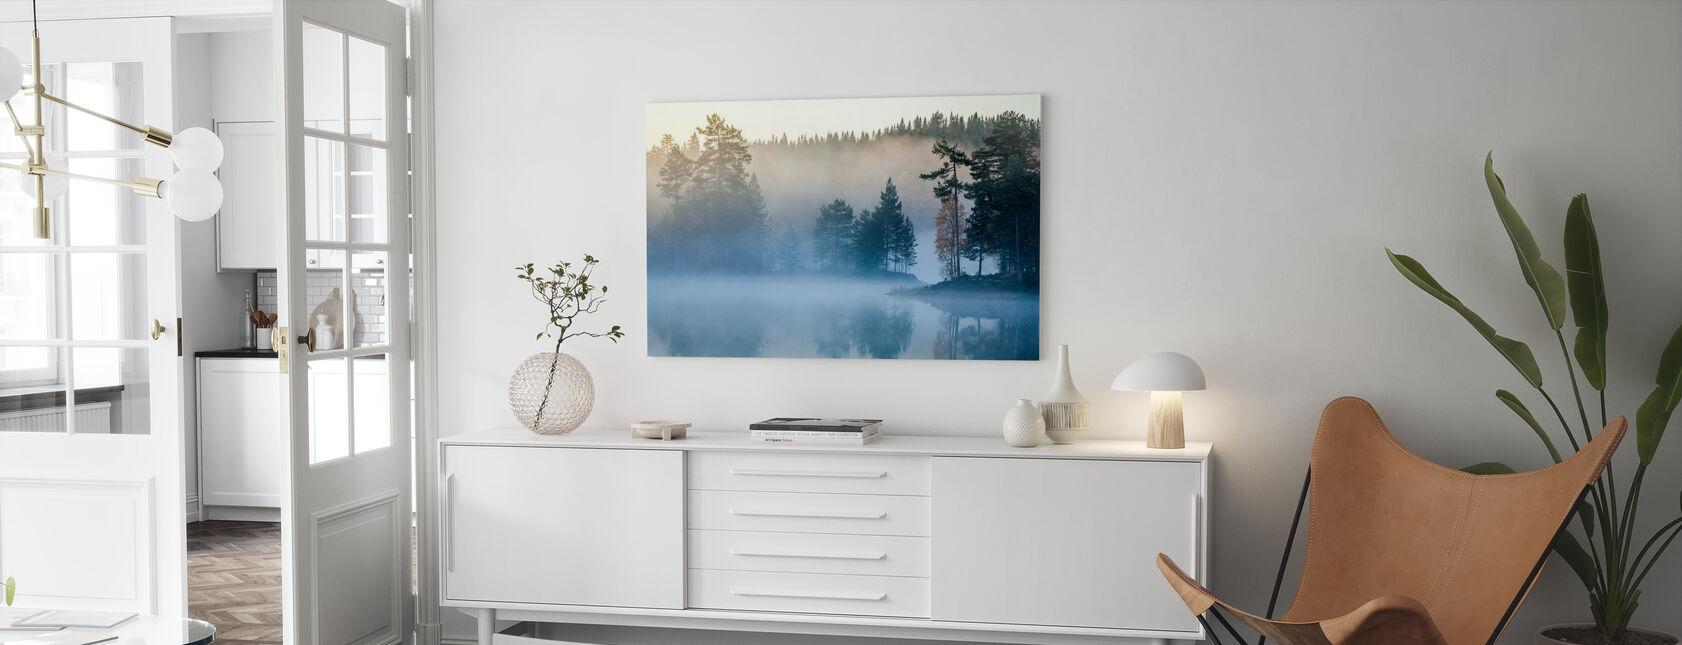 Neblina noruega - Lienzo - Salón